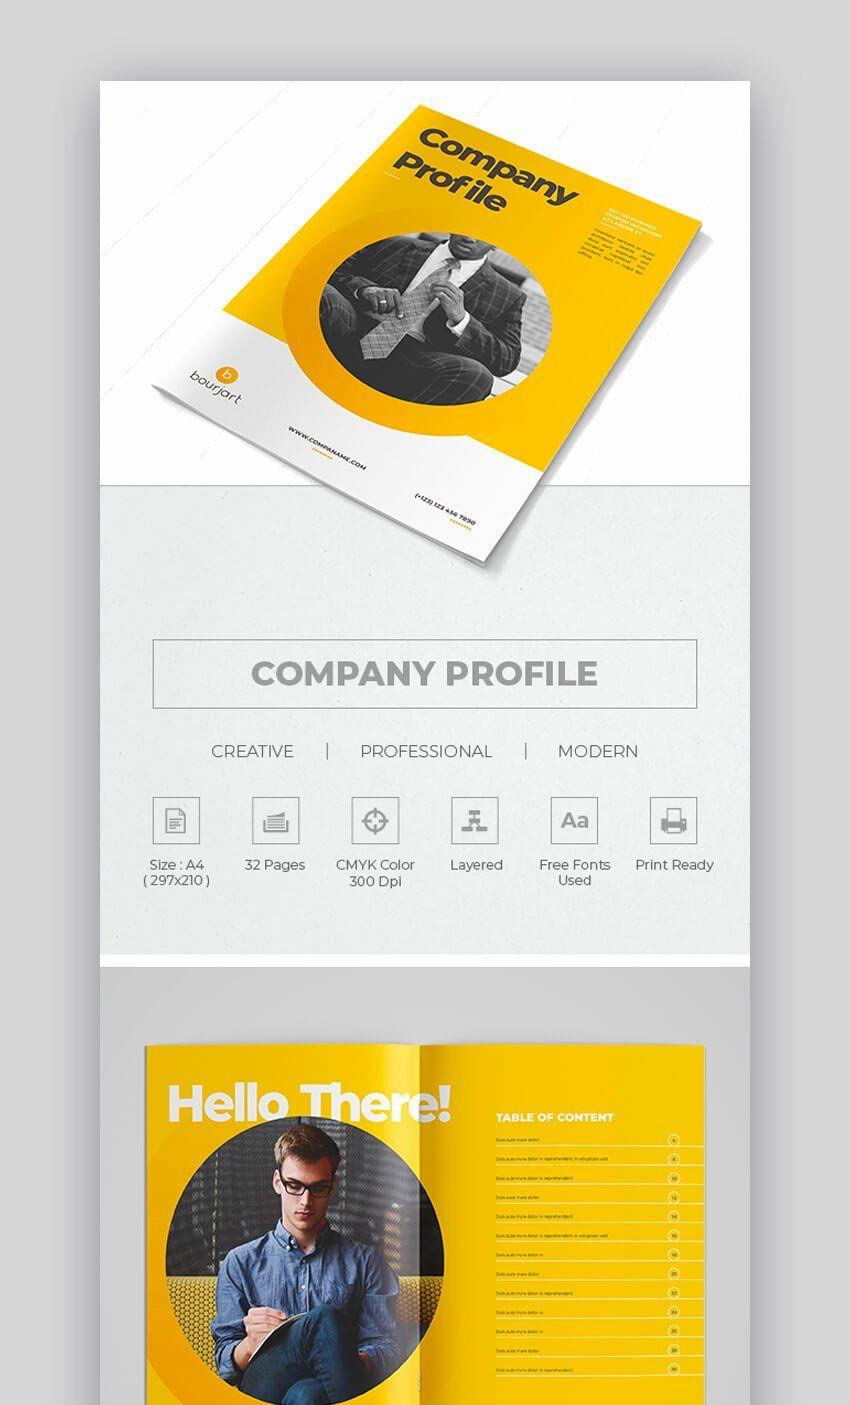 Free Quarter Fold Card Template Lovely 20 Best Professional Business Brochure Design T Brochure Design Template Business Brochure Design Free Brochure Template